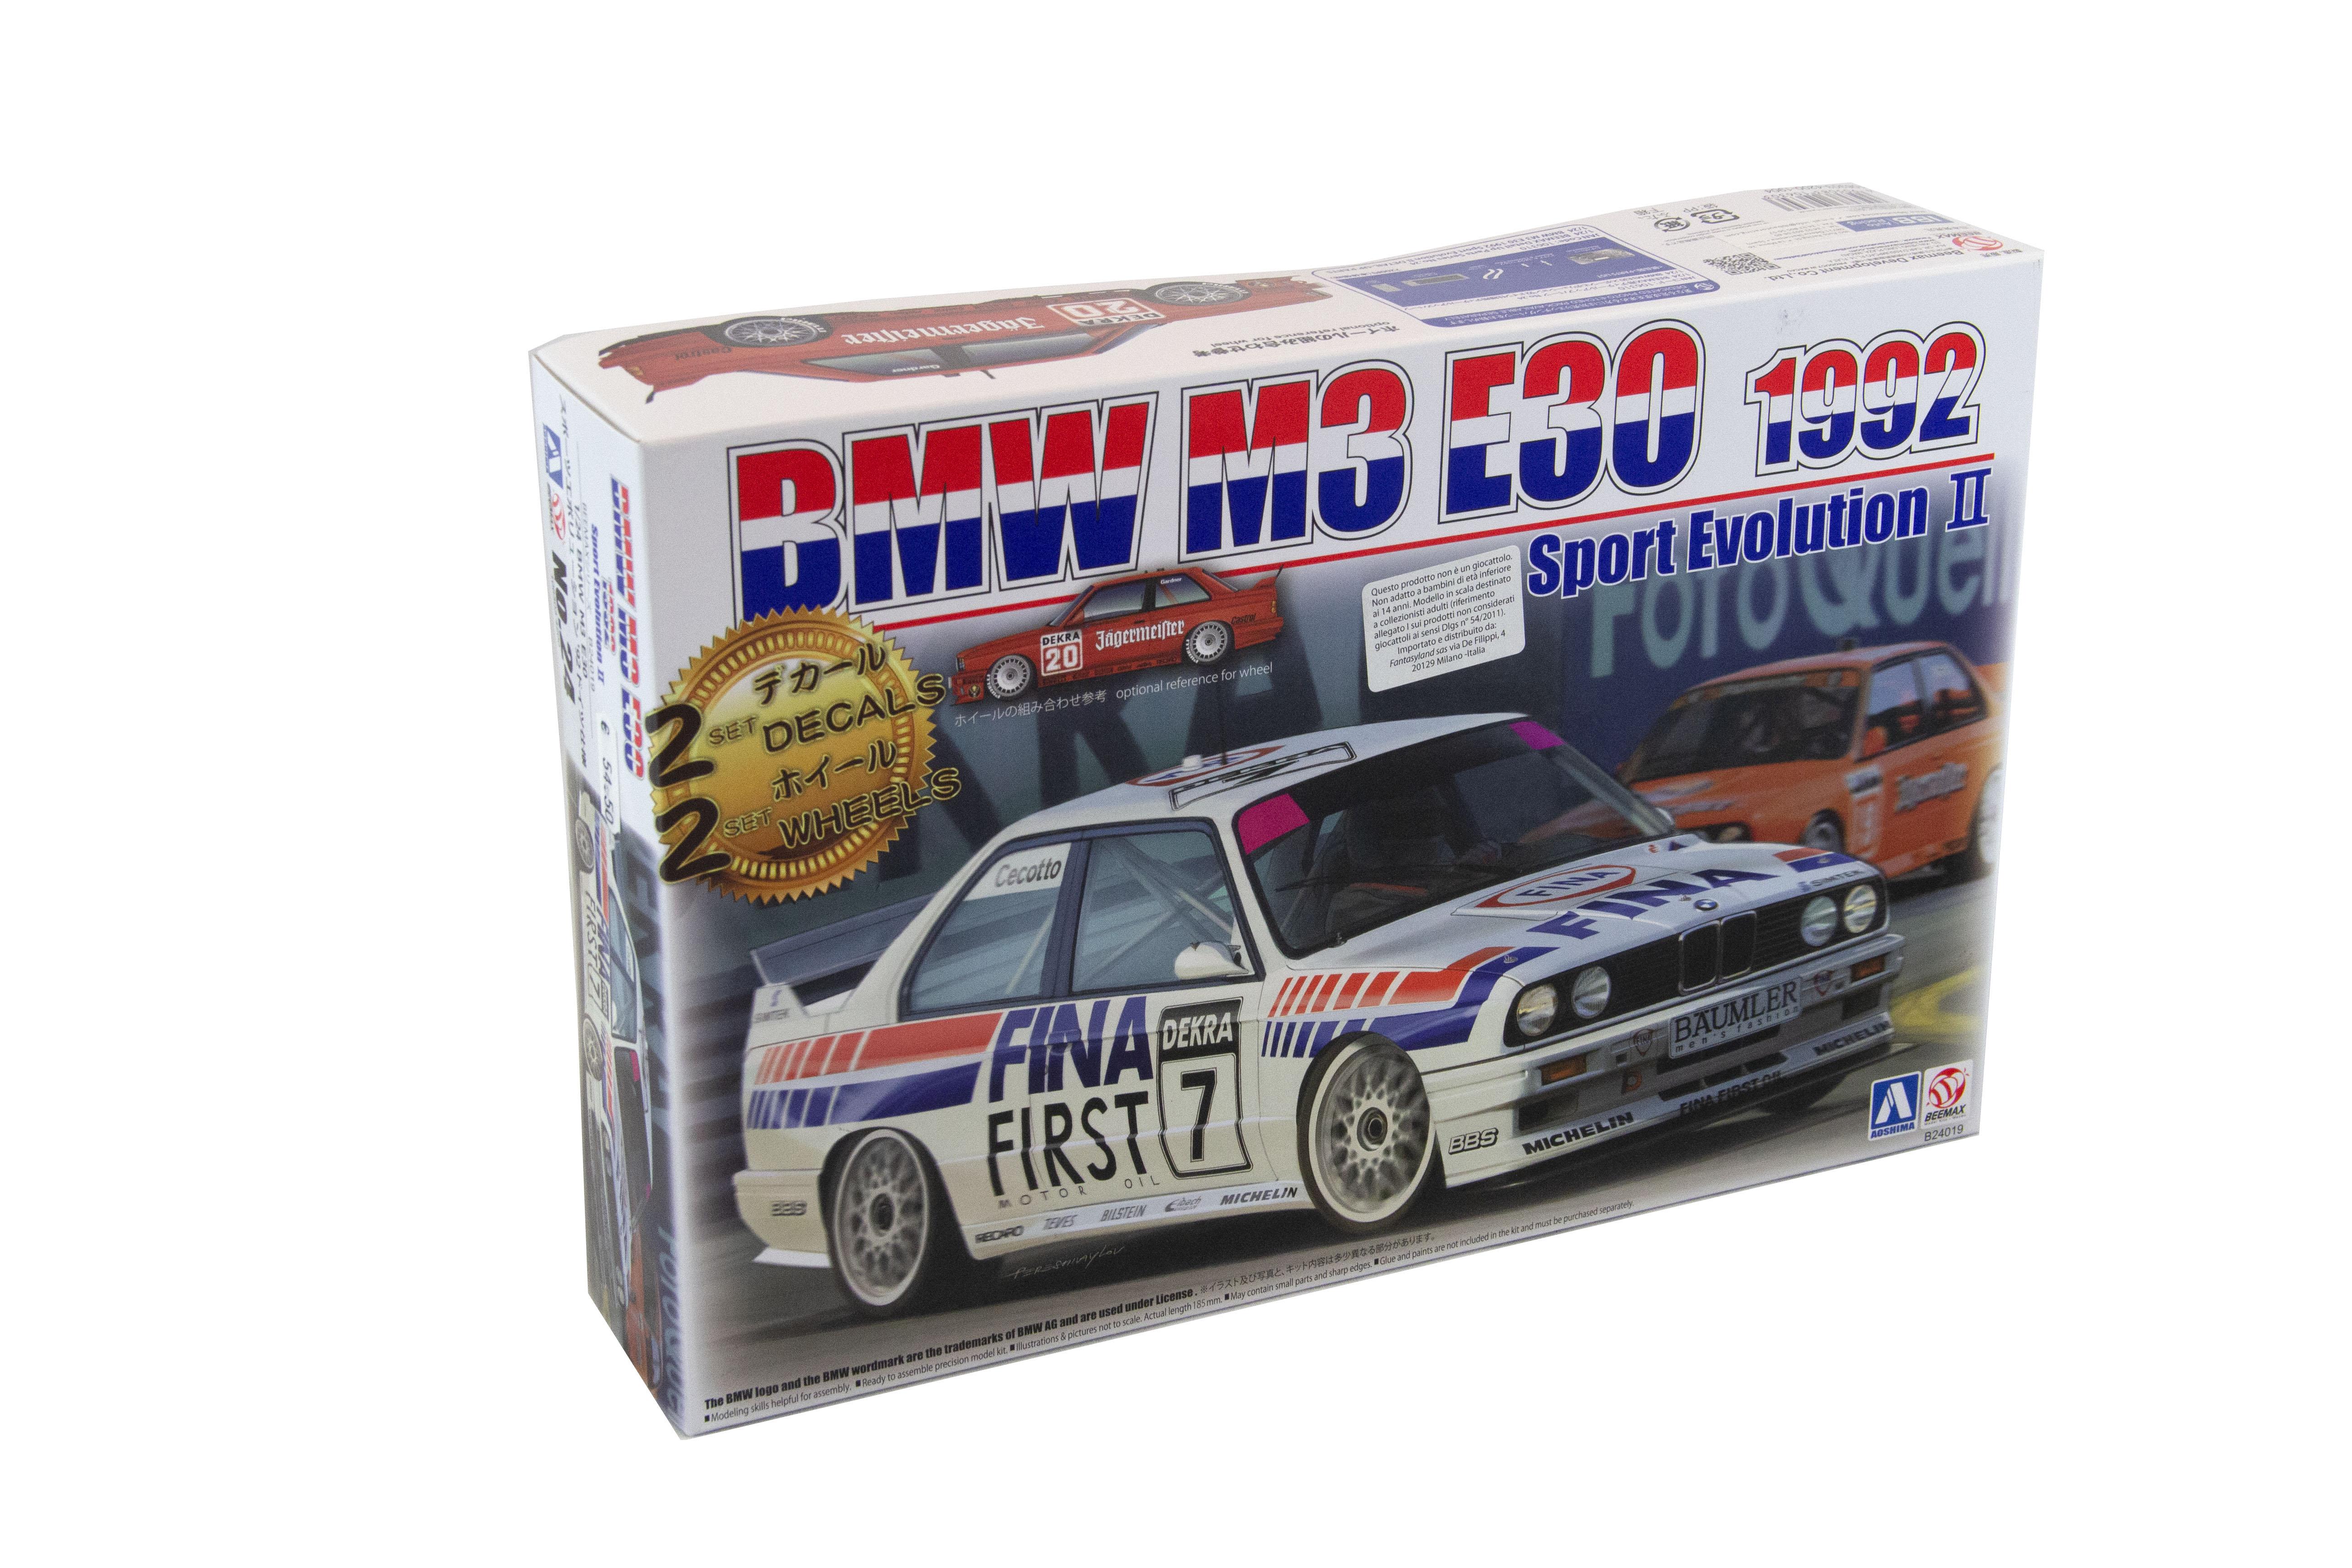 Kit Bmw M3 E30 Sport Evolution II 1992 1/20